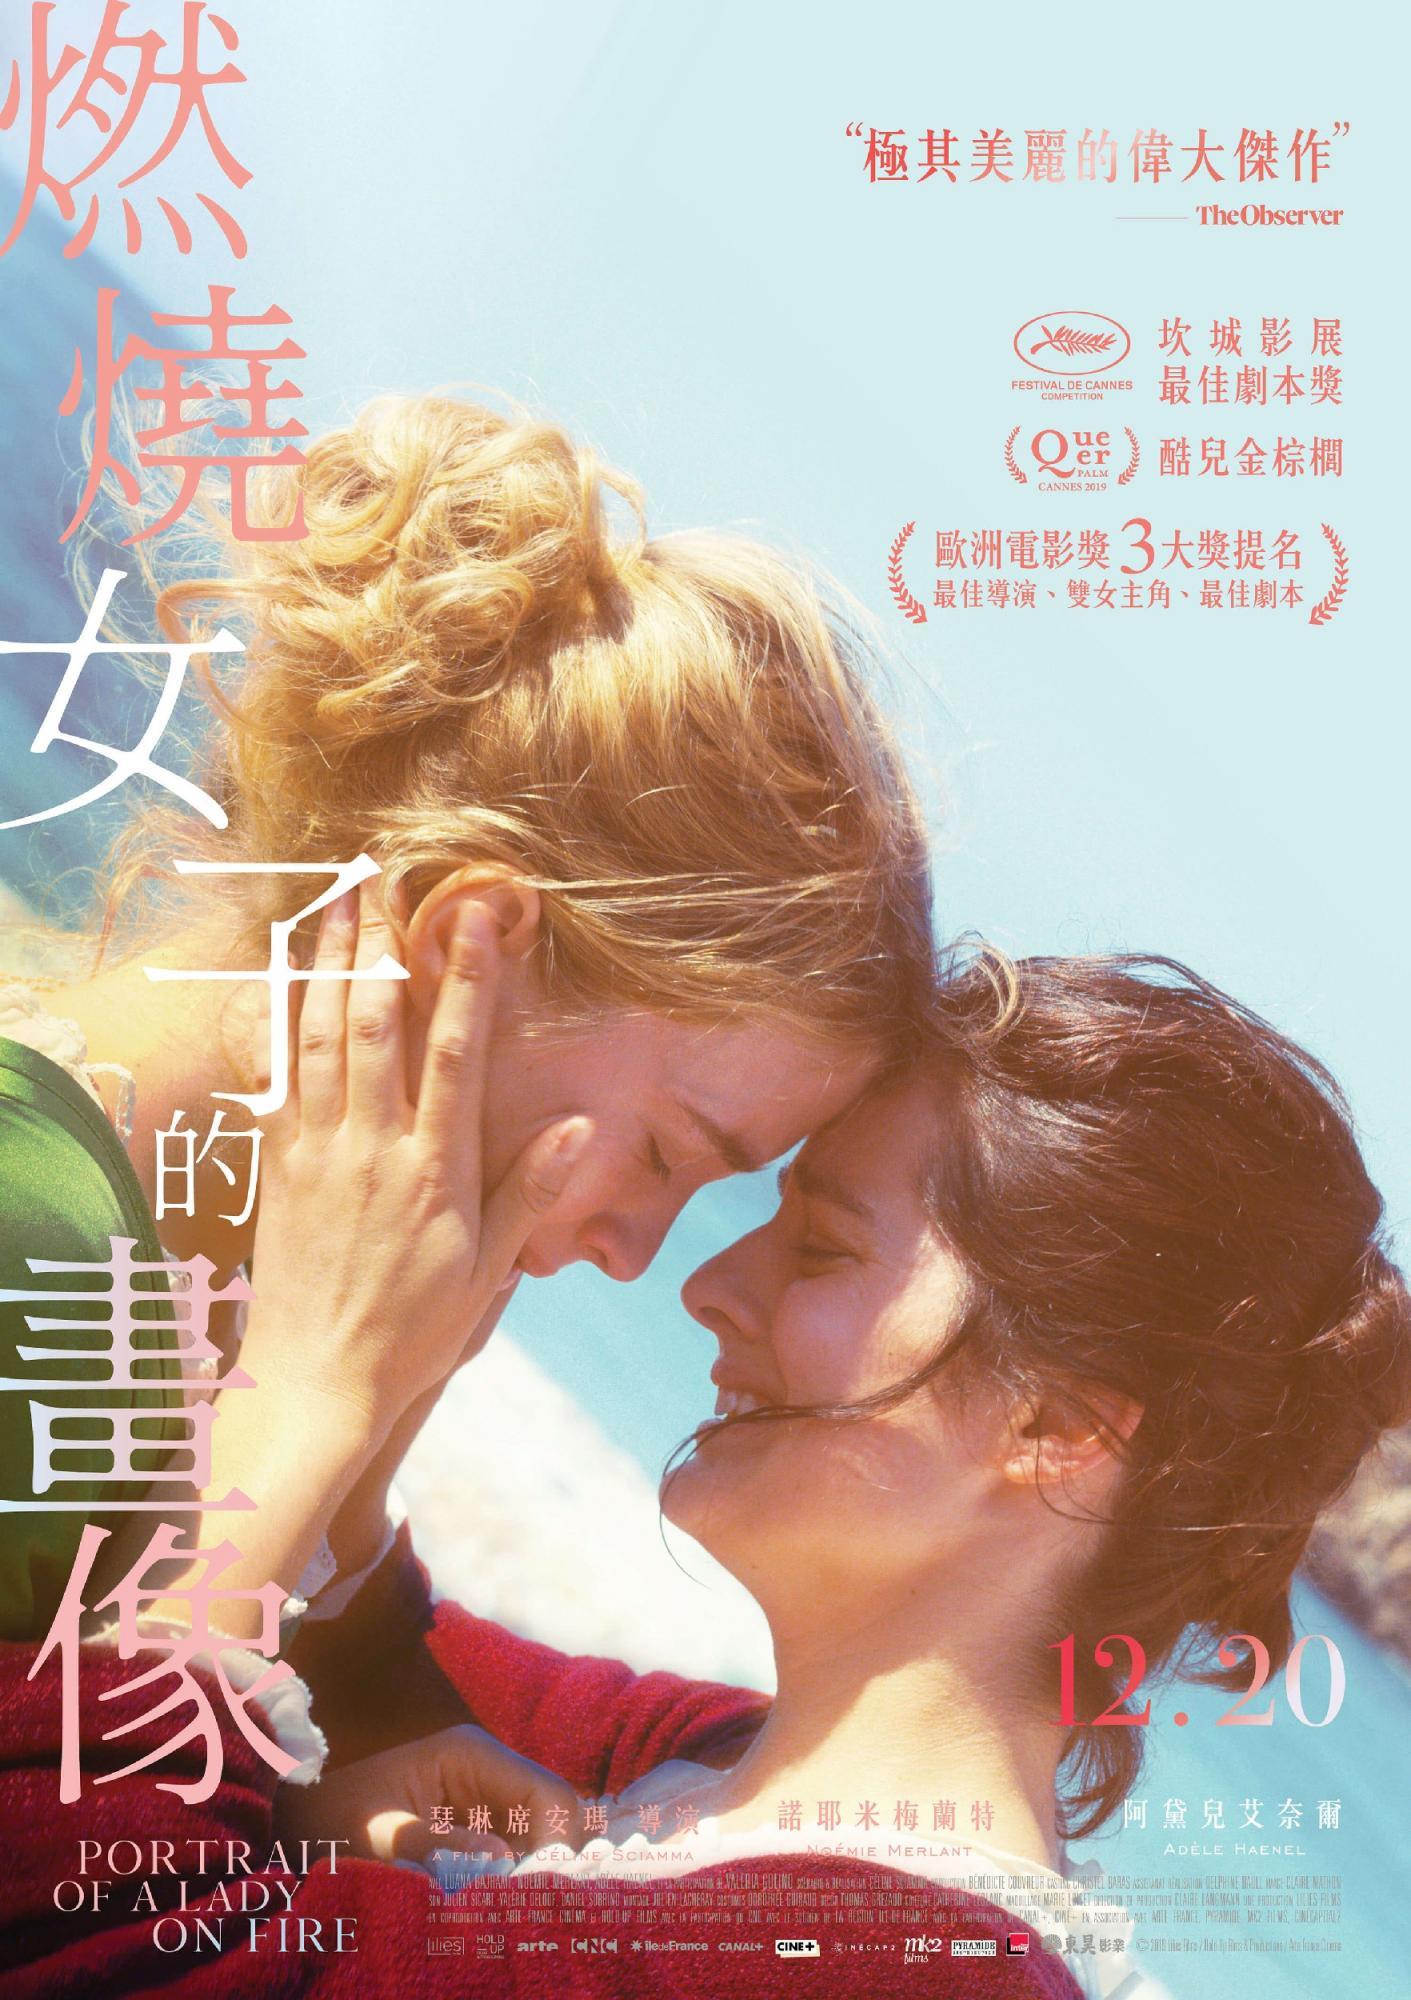 poster_web.jpg